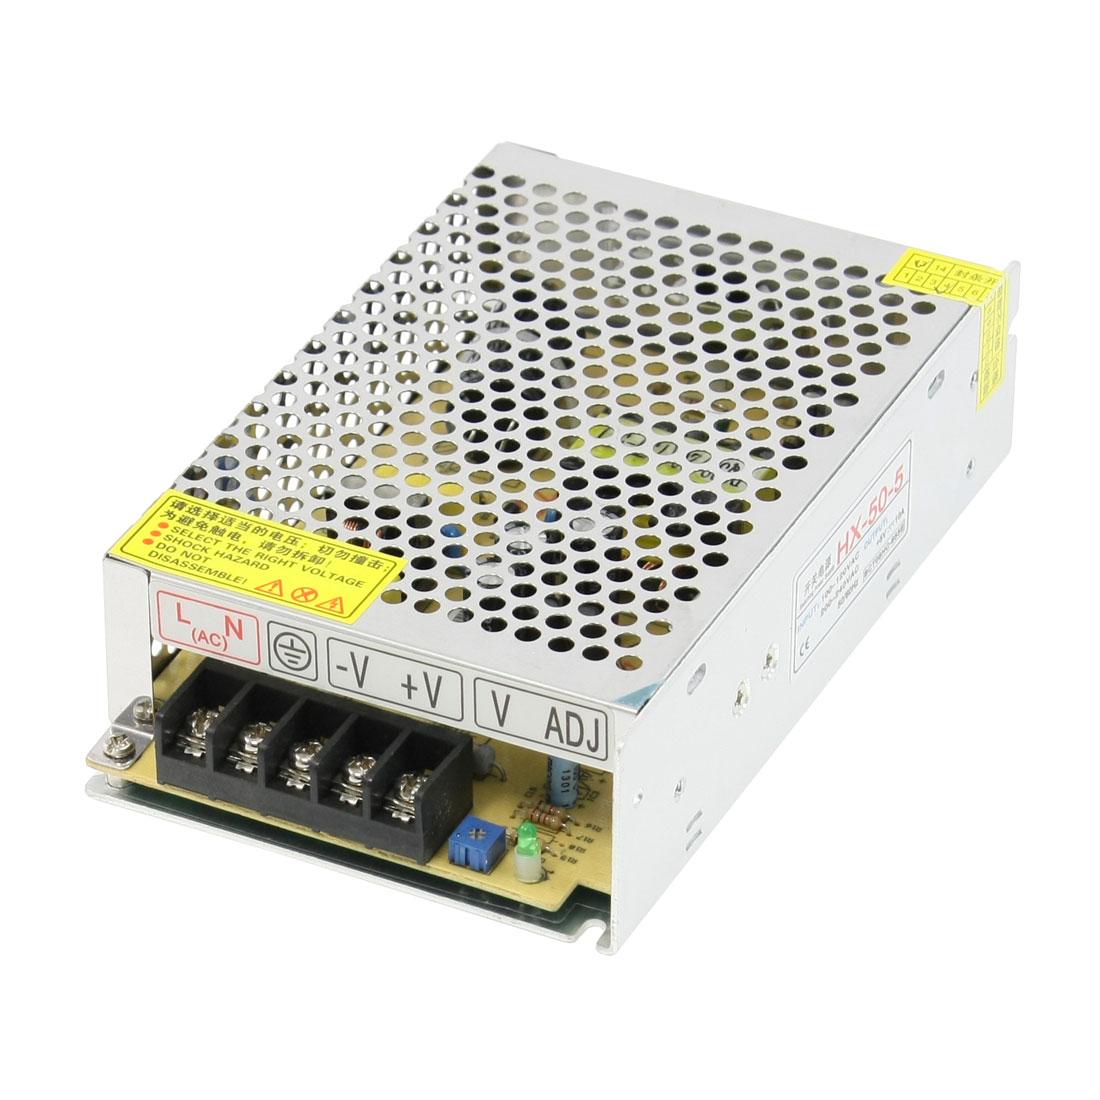 LED Illumination Power Supply Adapter Convertor 50W 100-120VAC to DC5V 10A